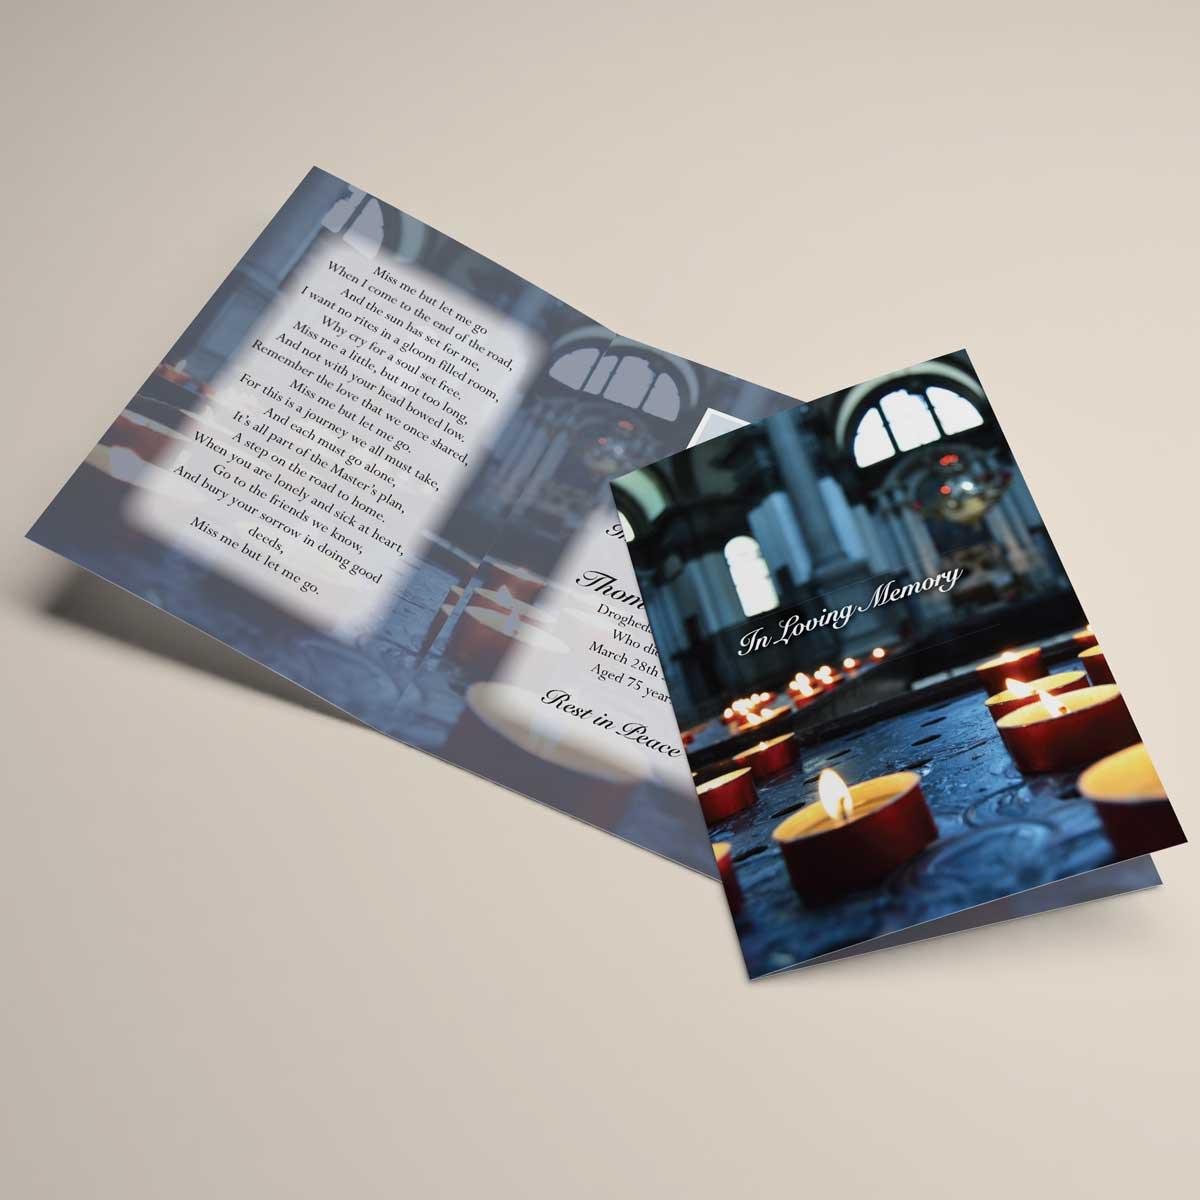 Religious inspired memorial card design - candles